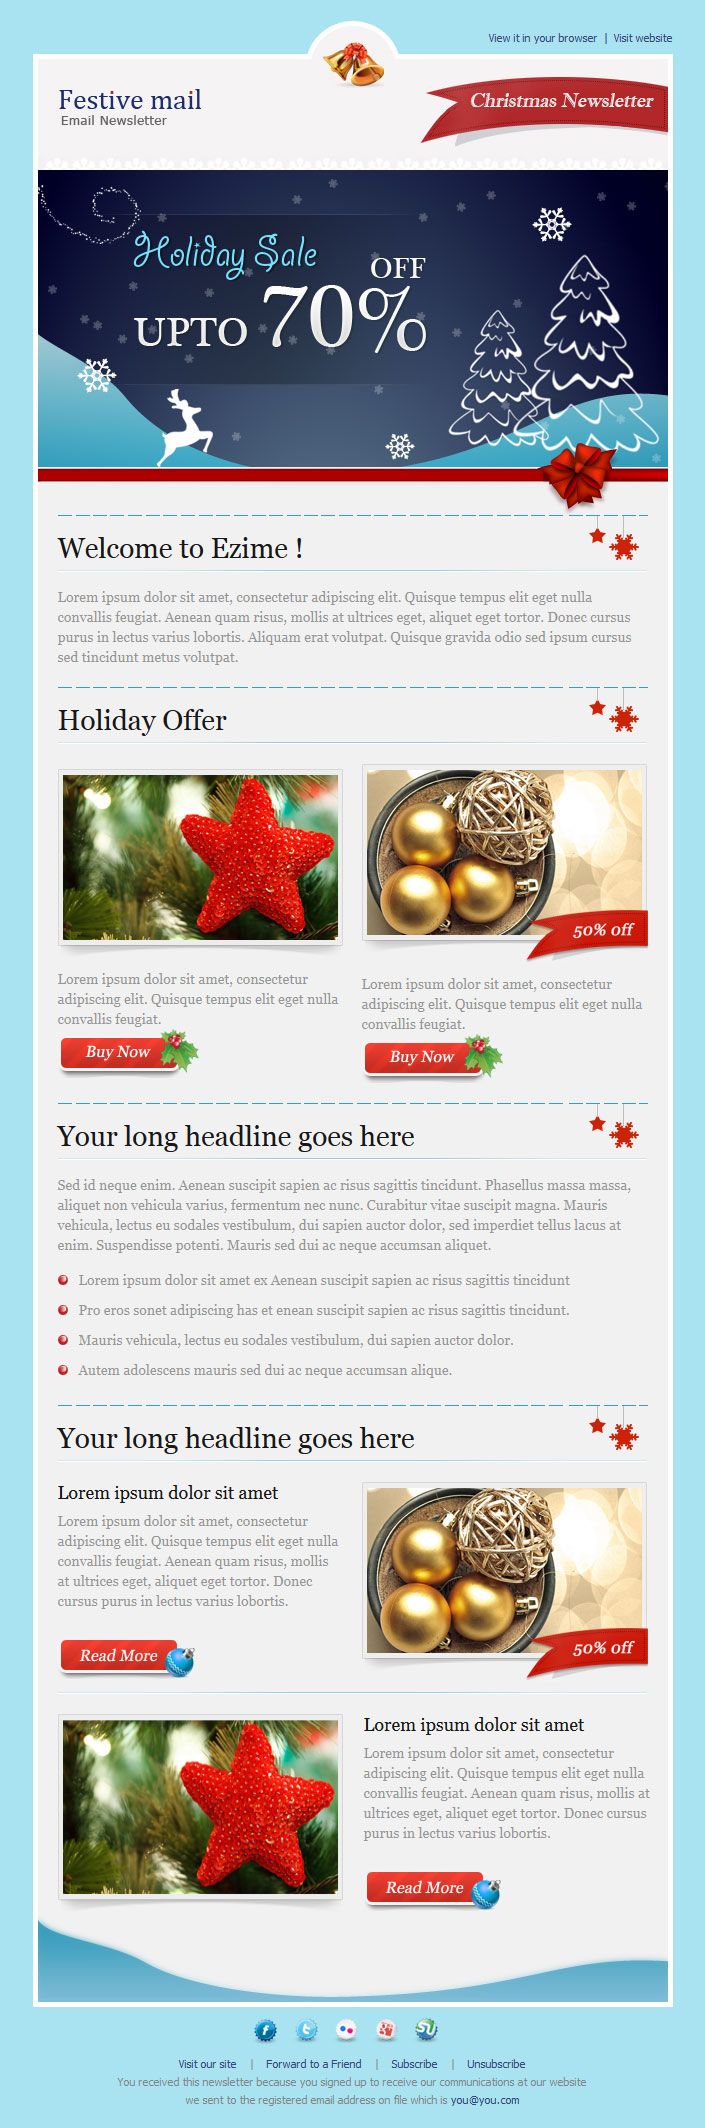 email newsletter Content Heavy Digital Design – Email Newsletter